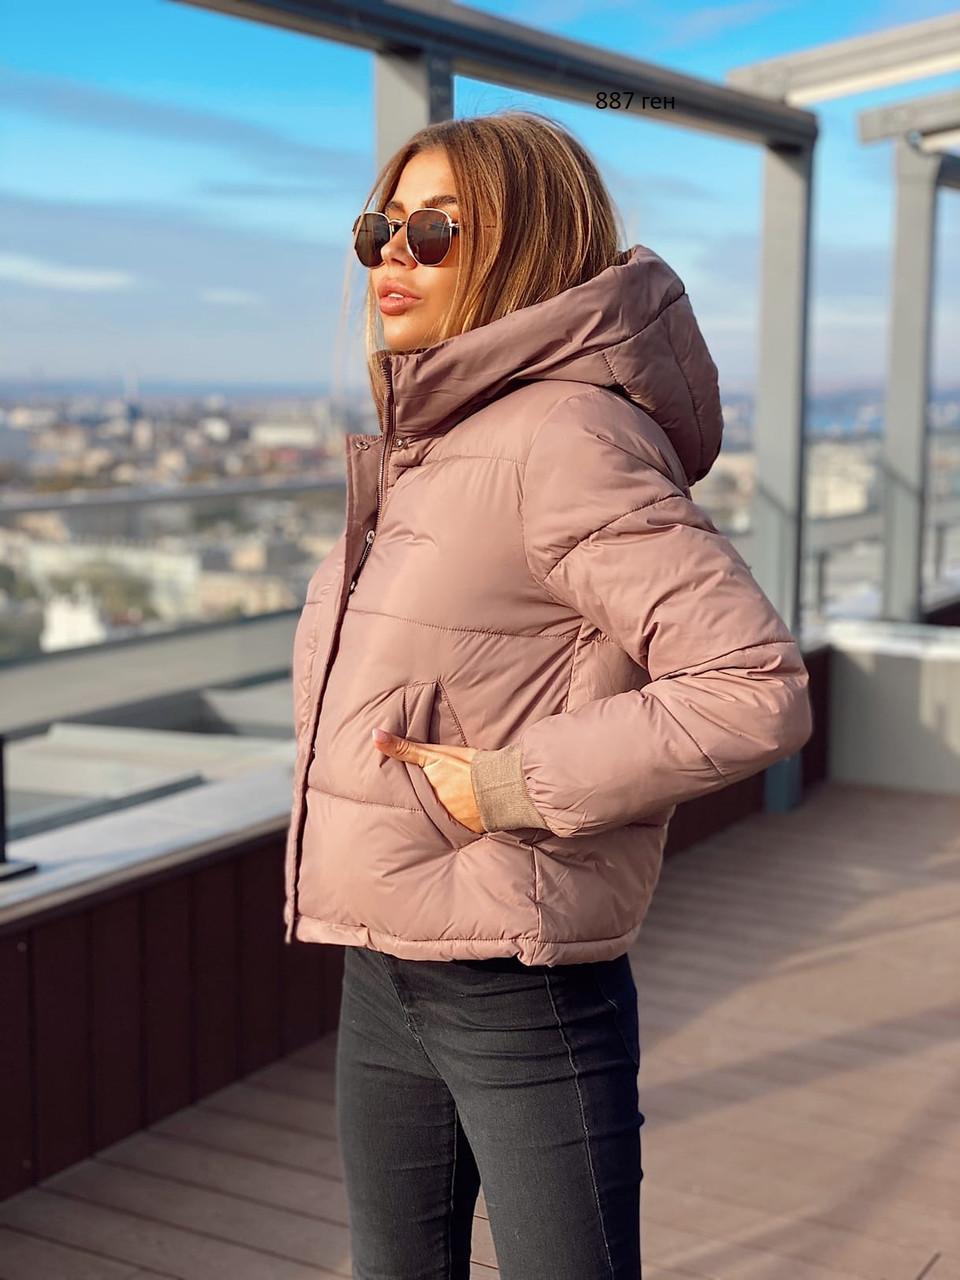 Куртка женская зима 887 ген